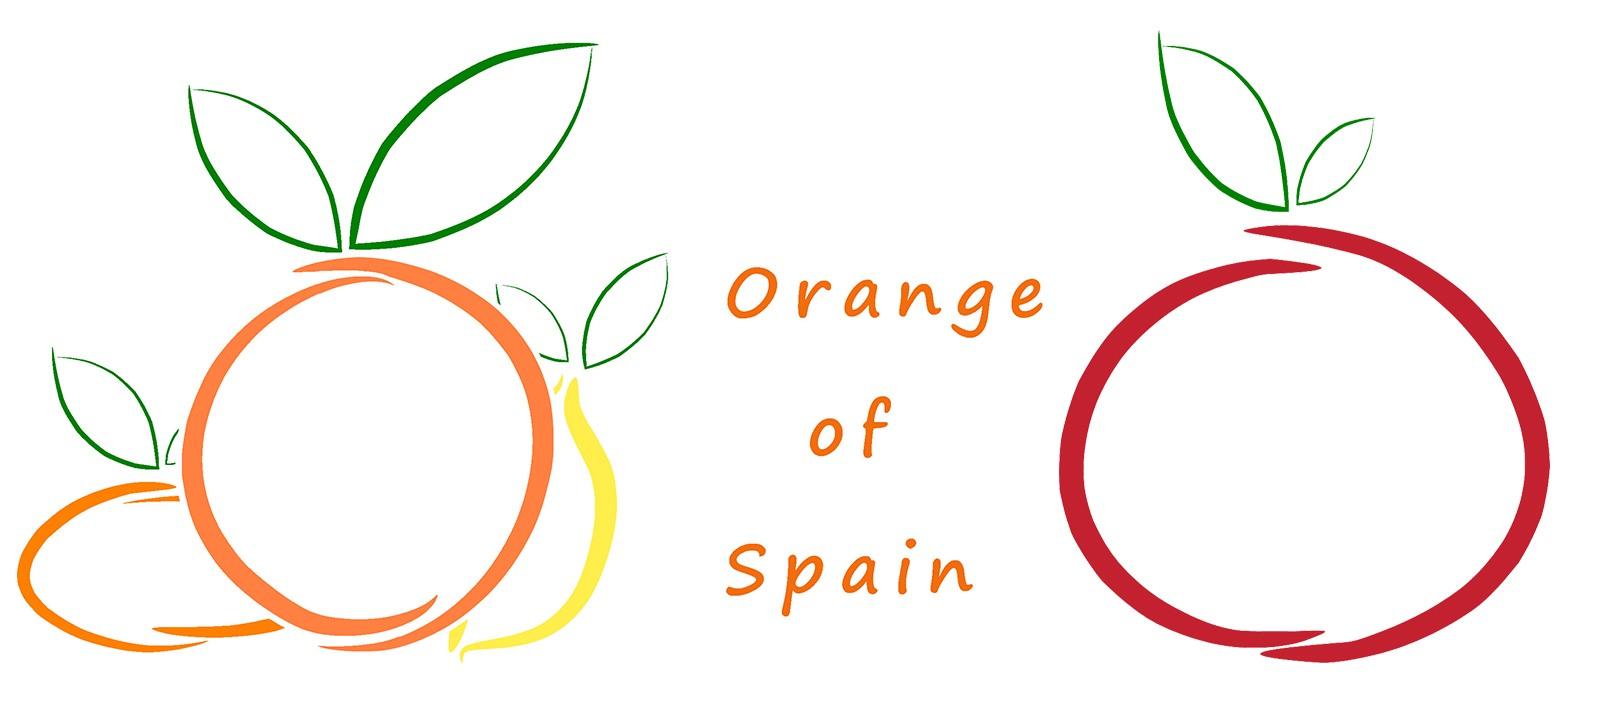 Orange of Spain